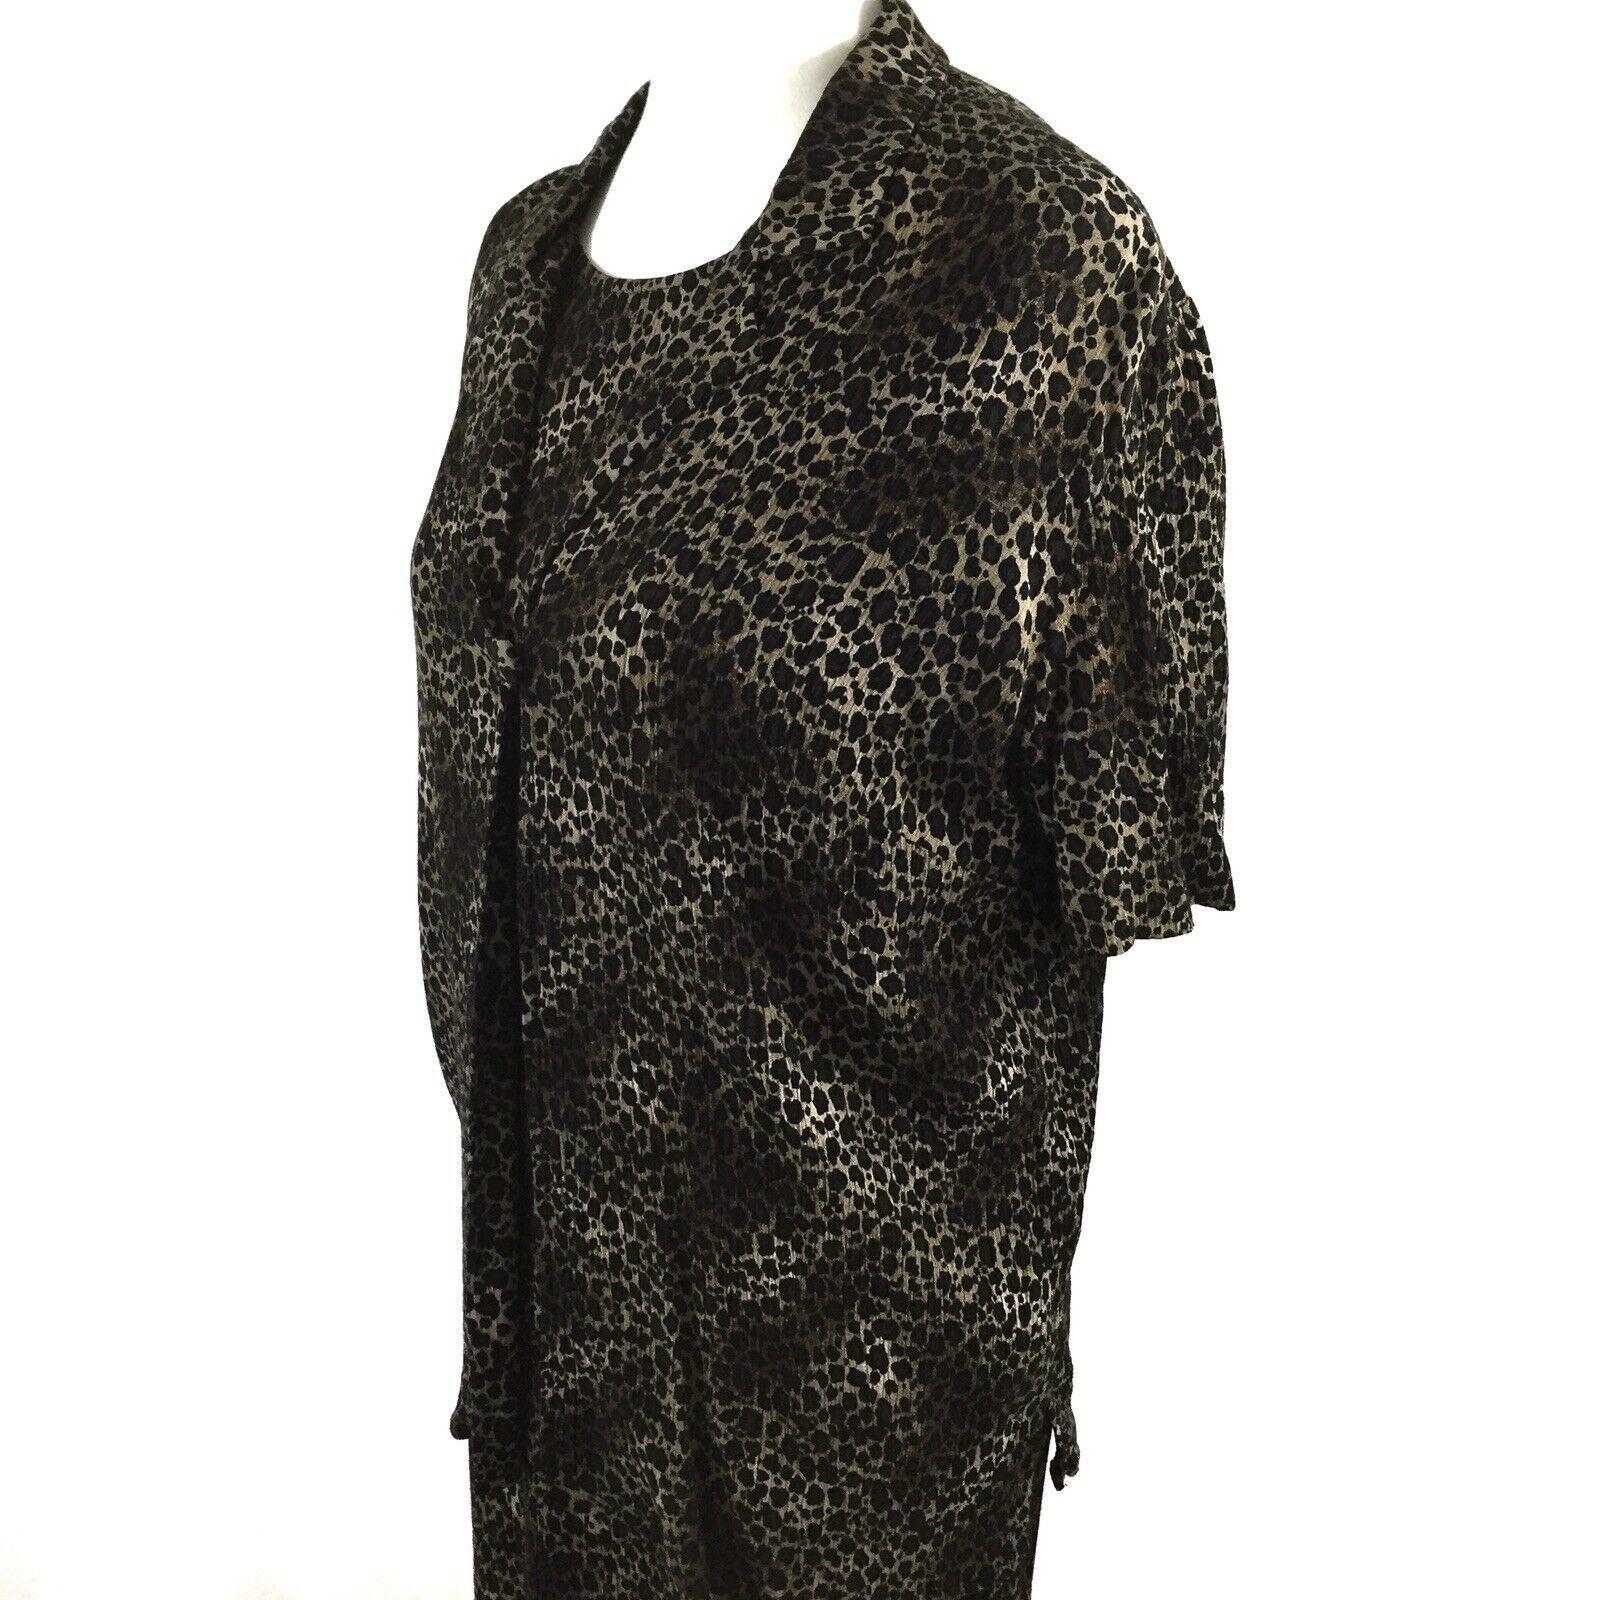 KSL Karin Stevens Sleeveless Maxi Dress and Jacket Size 14W Brown Animal Print image 5